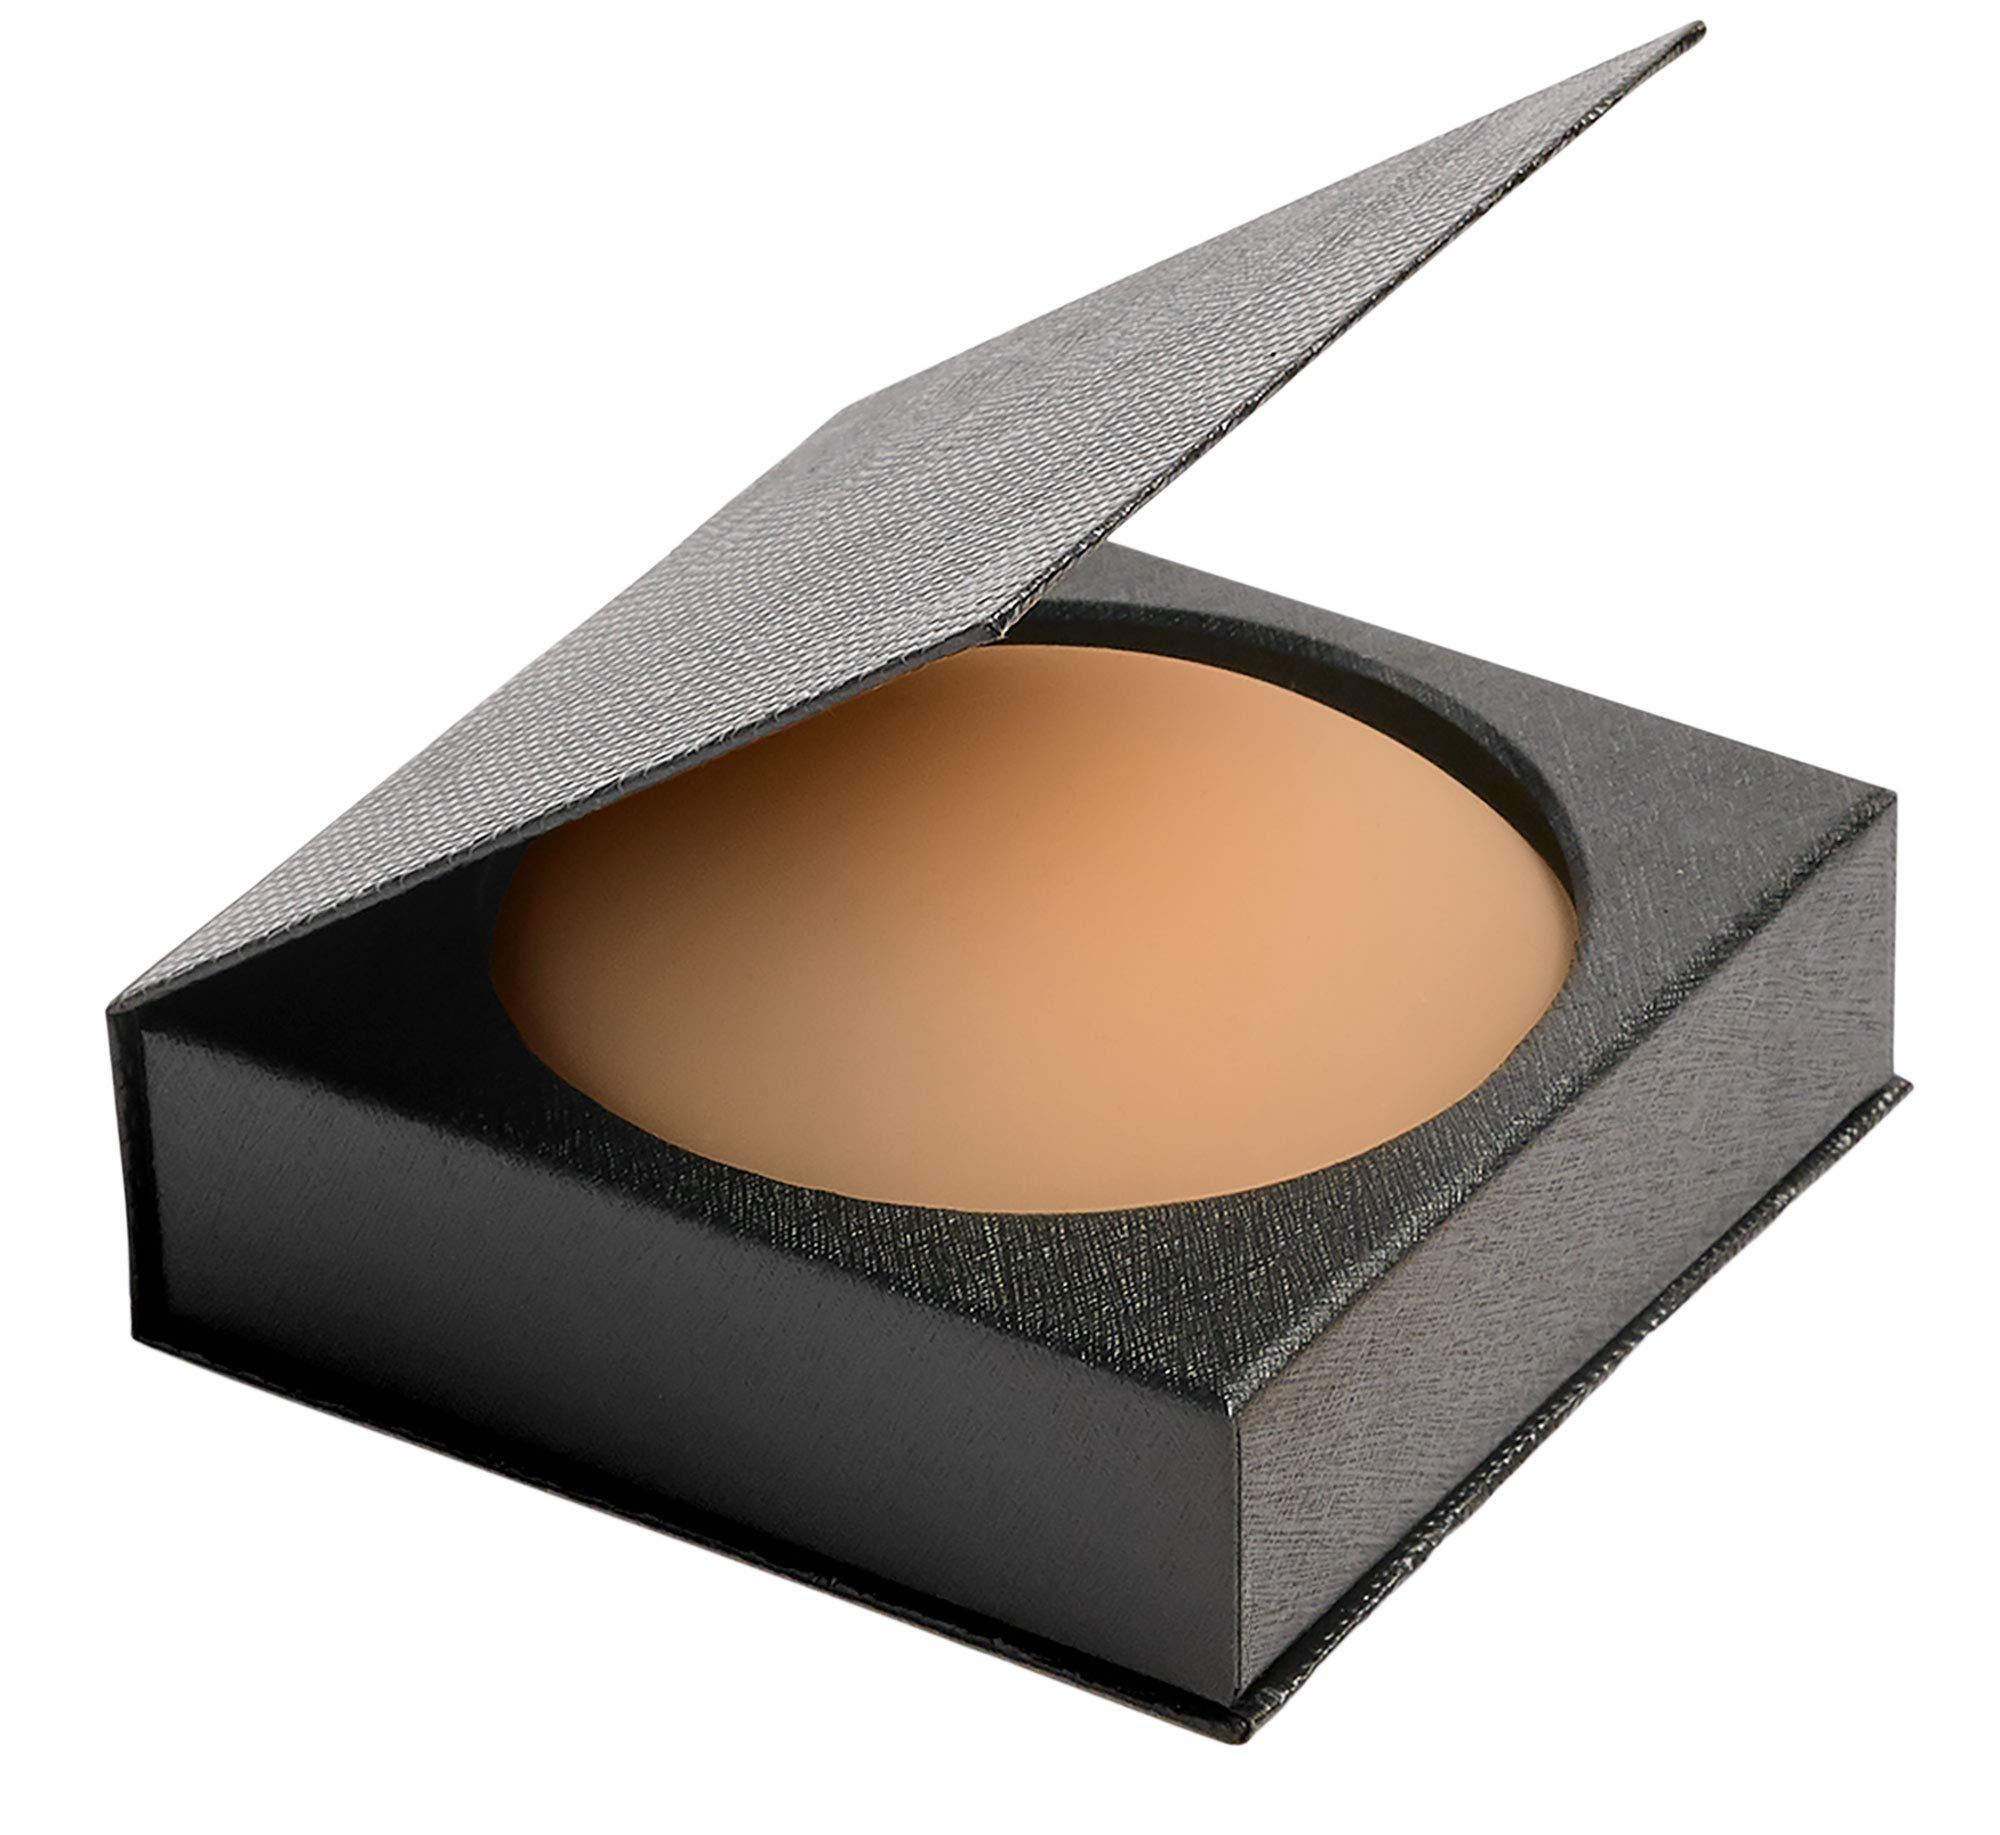 Skin ULTIMATE ADHESIVE NippleCovers Pasties & Travel Case - Caramel